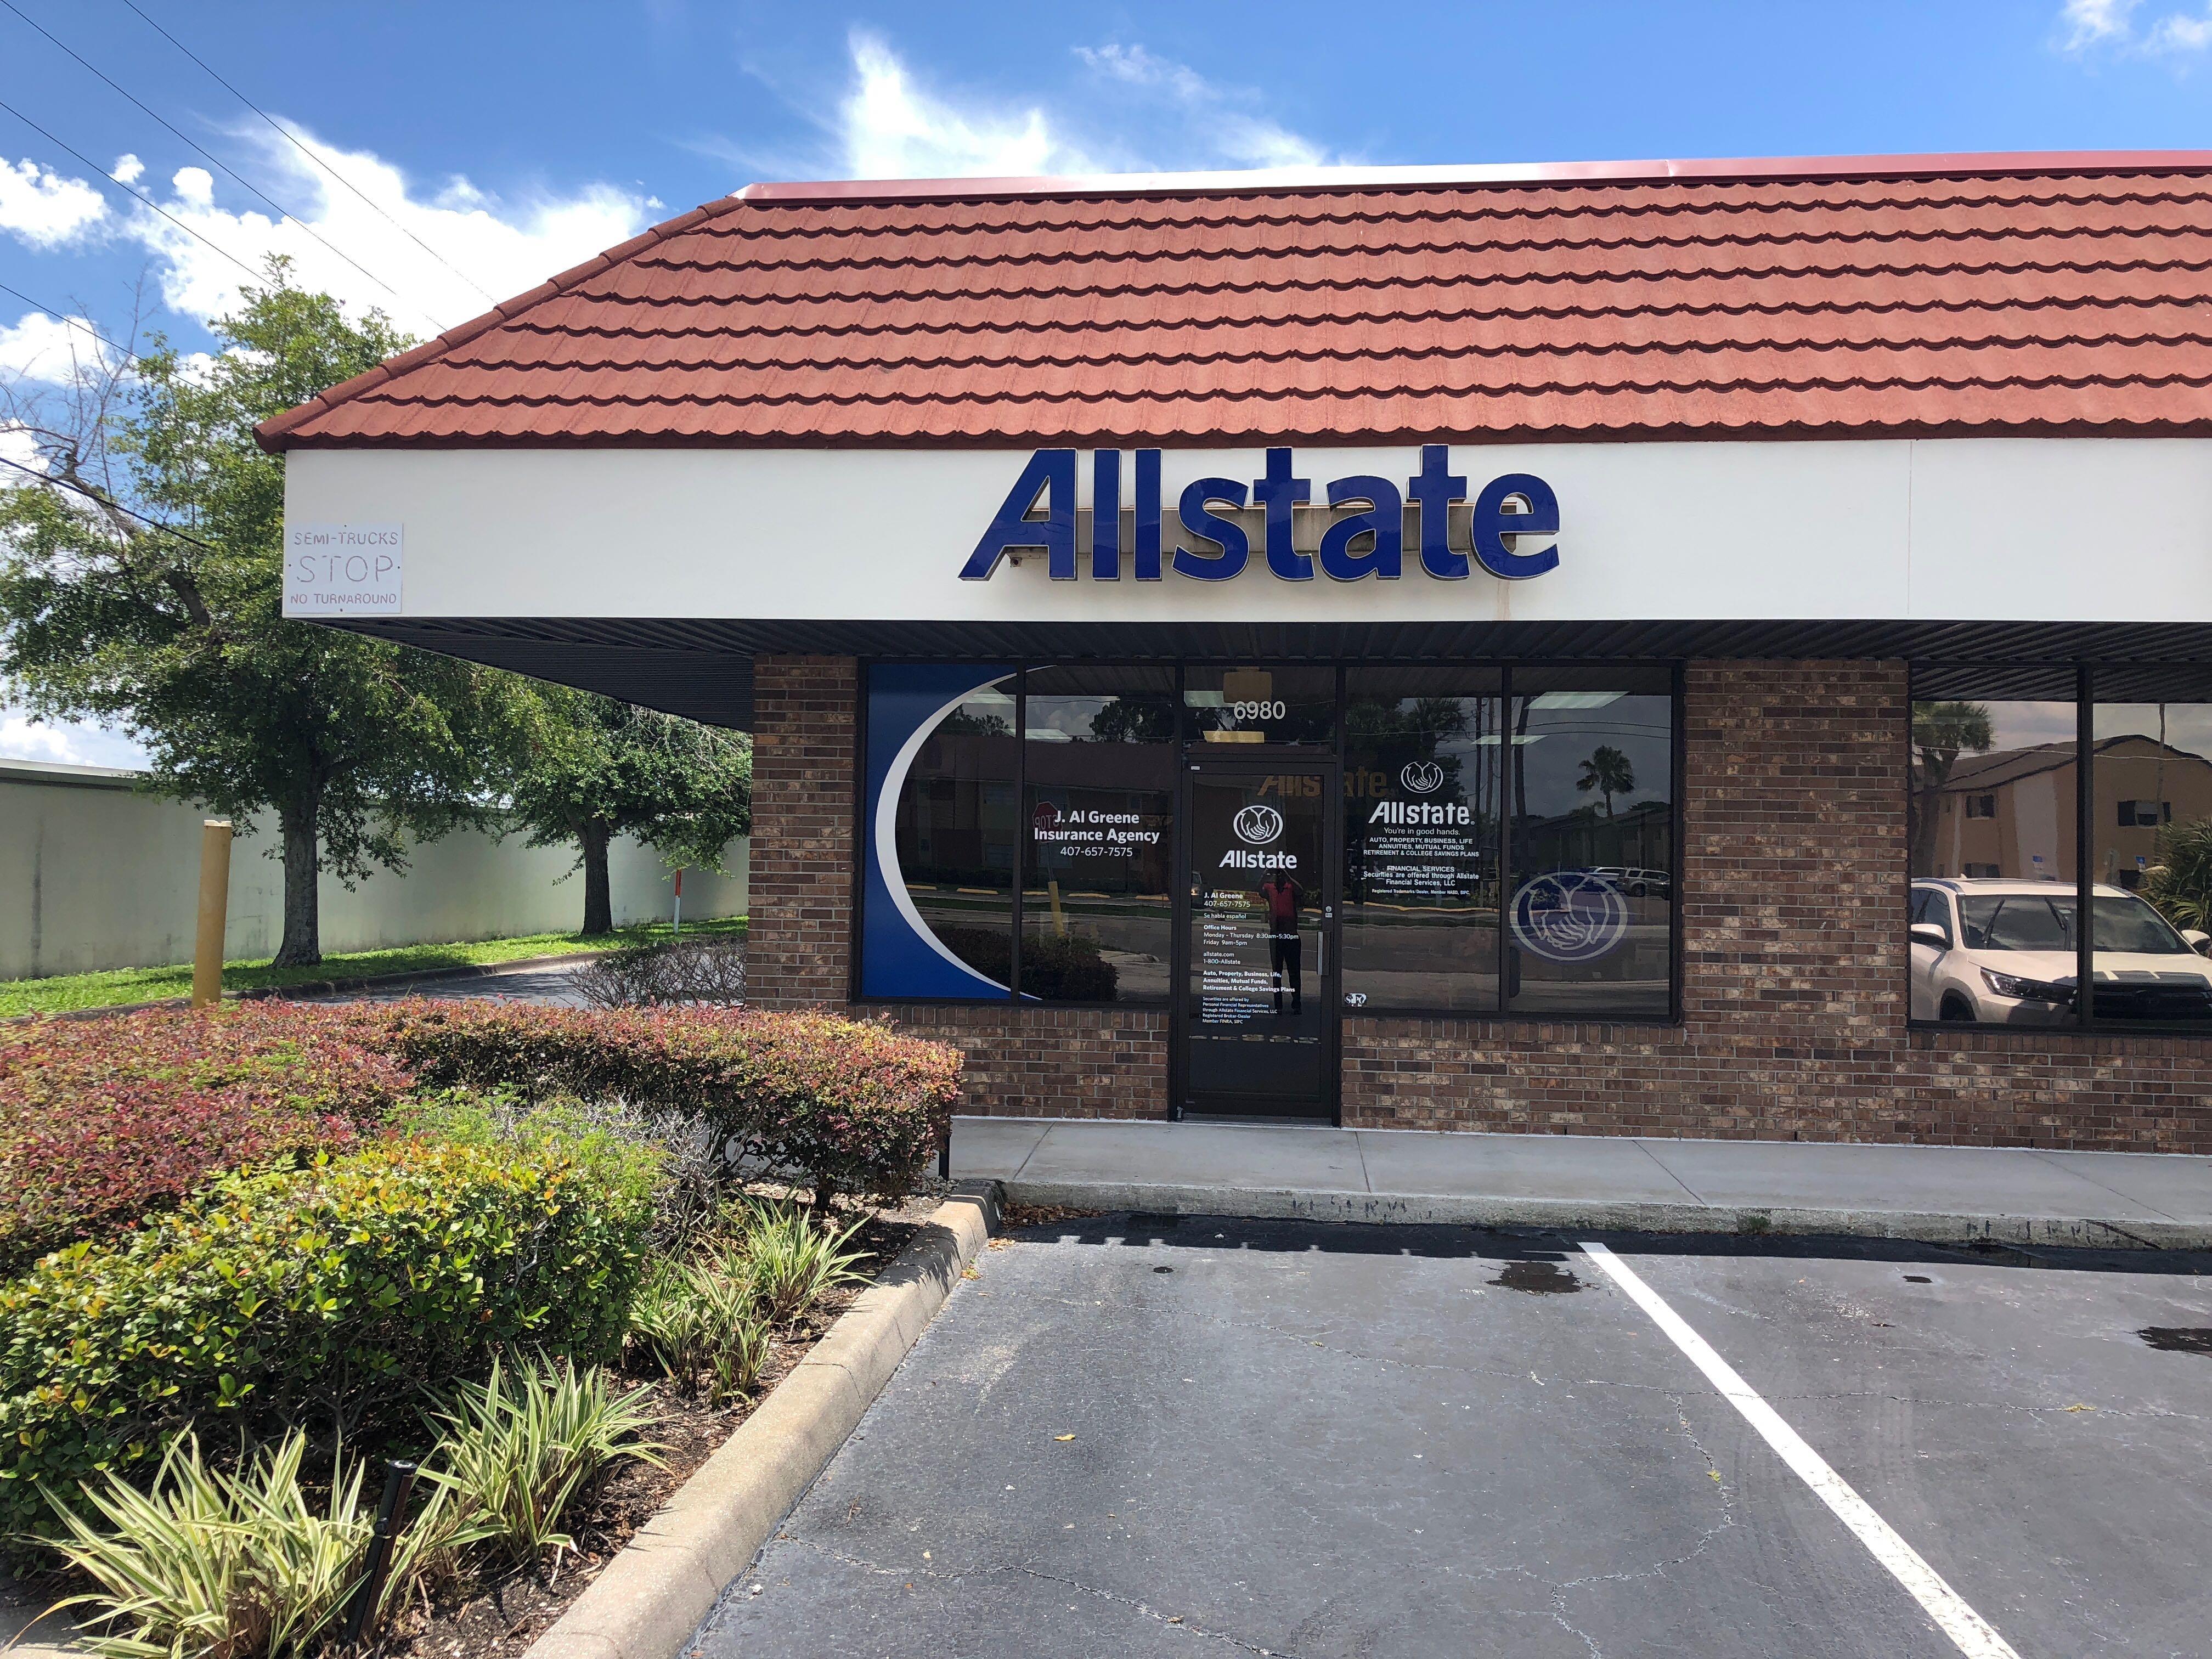 J. Al Greene: Allstate Insurance